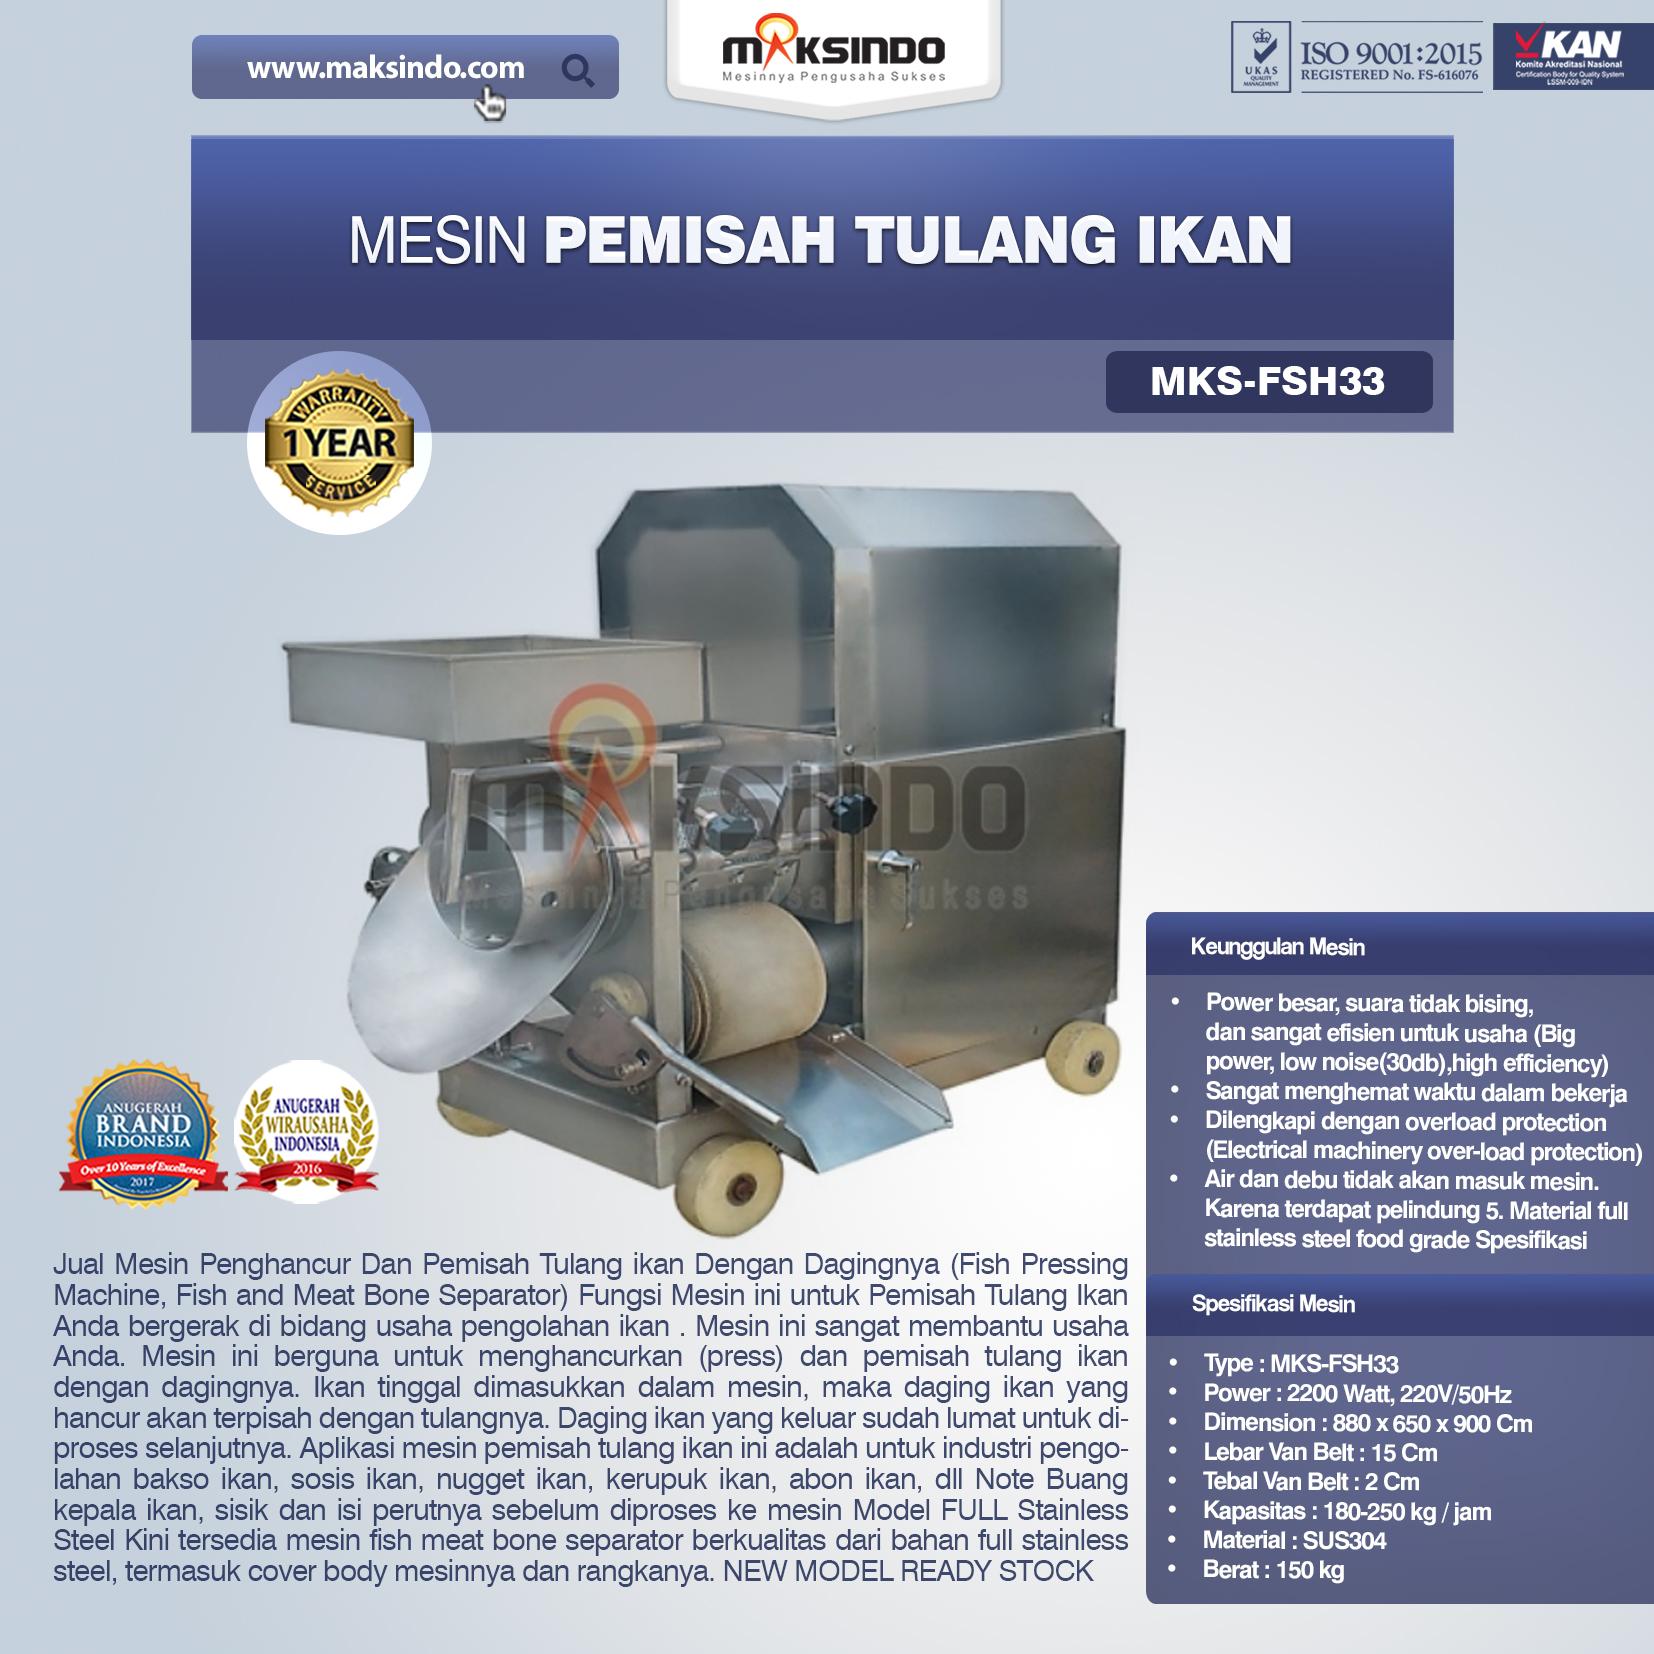 Jual Mesin Pemisah Tulang Ikan FSH33 di Palembang